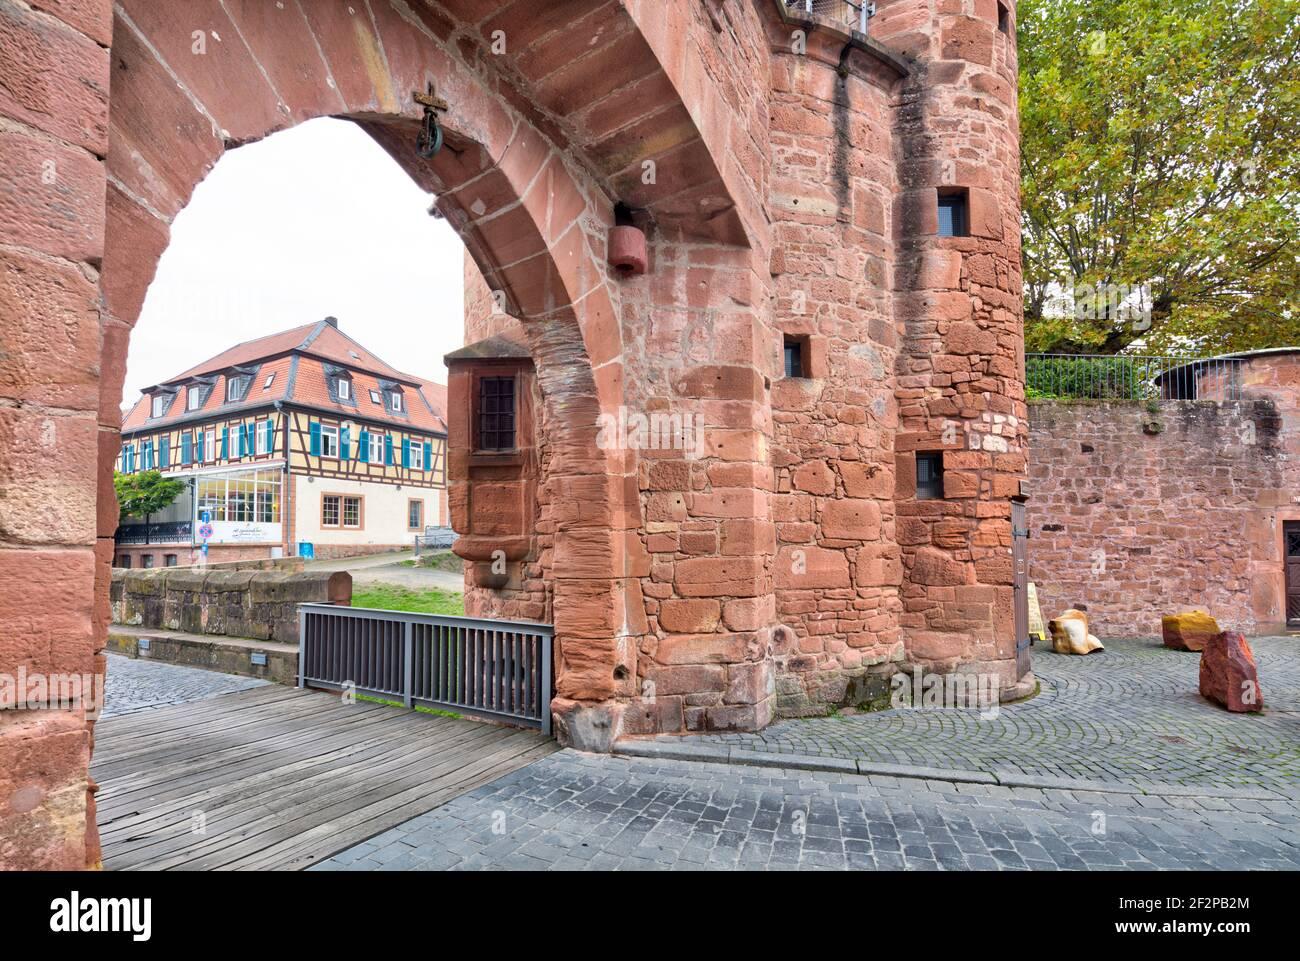 Jerusalem Gate, Untertor, city wall, city fortifications, historic old town, Büdingen, Hessen, Germany, Europe Stock Photo